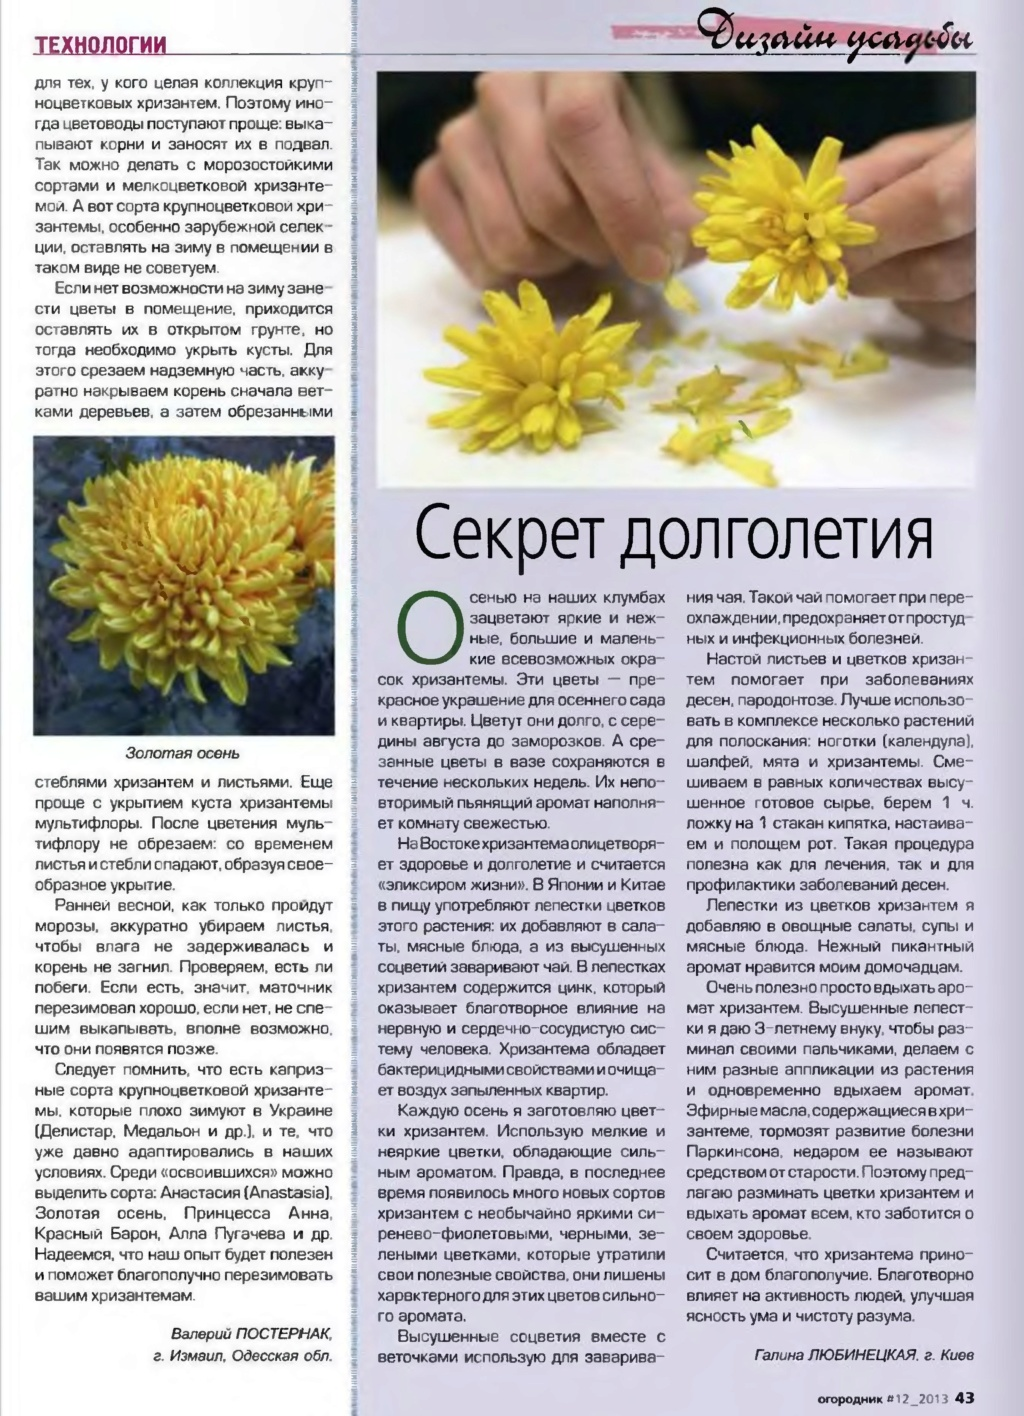 хризантема P003610